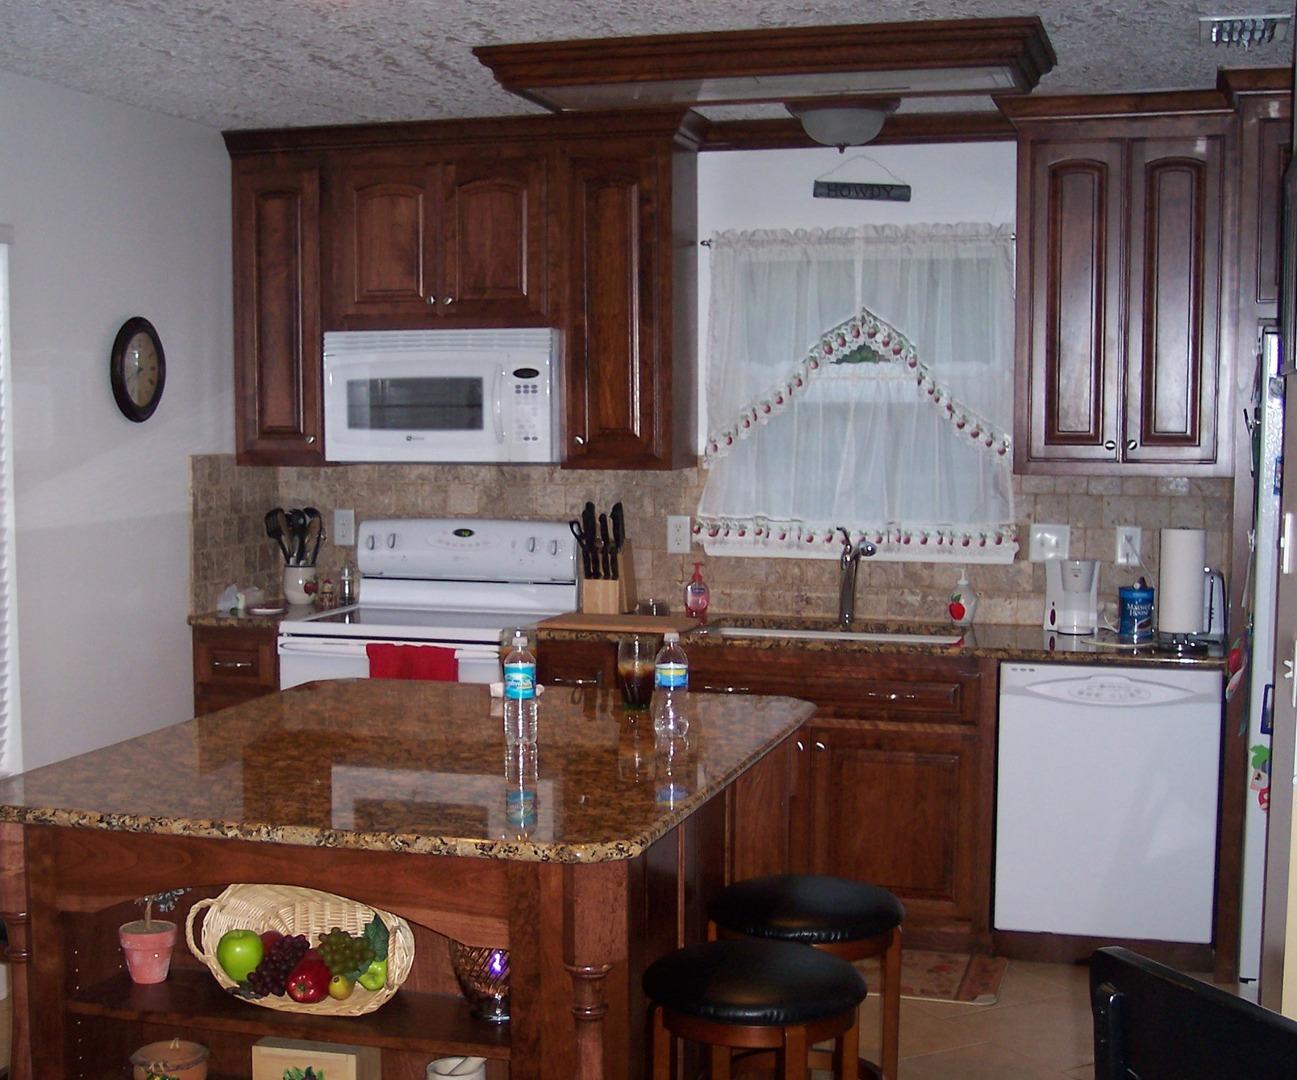 kitchen remodeling contractors jacksonville fl 1 kitchen remodel jacksonville fl Dinning Room Kitchen Remodeling Jacksonville Florida